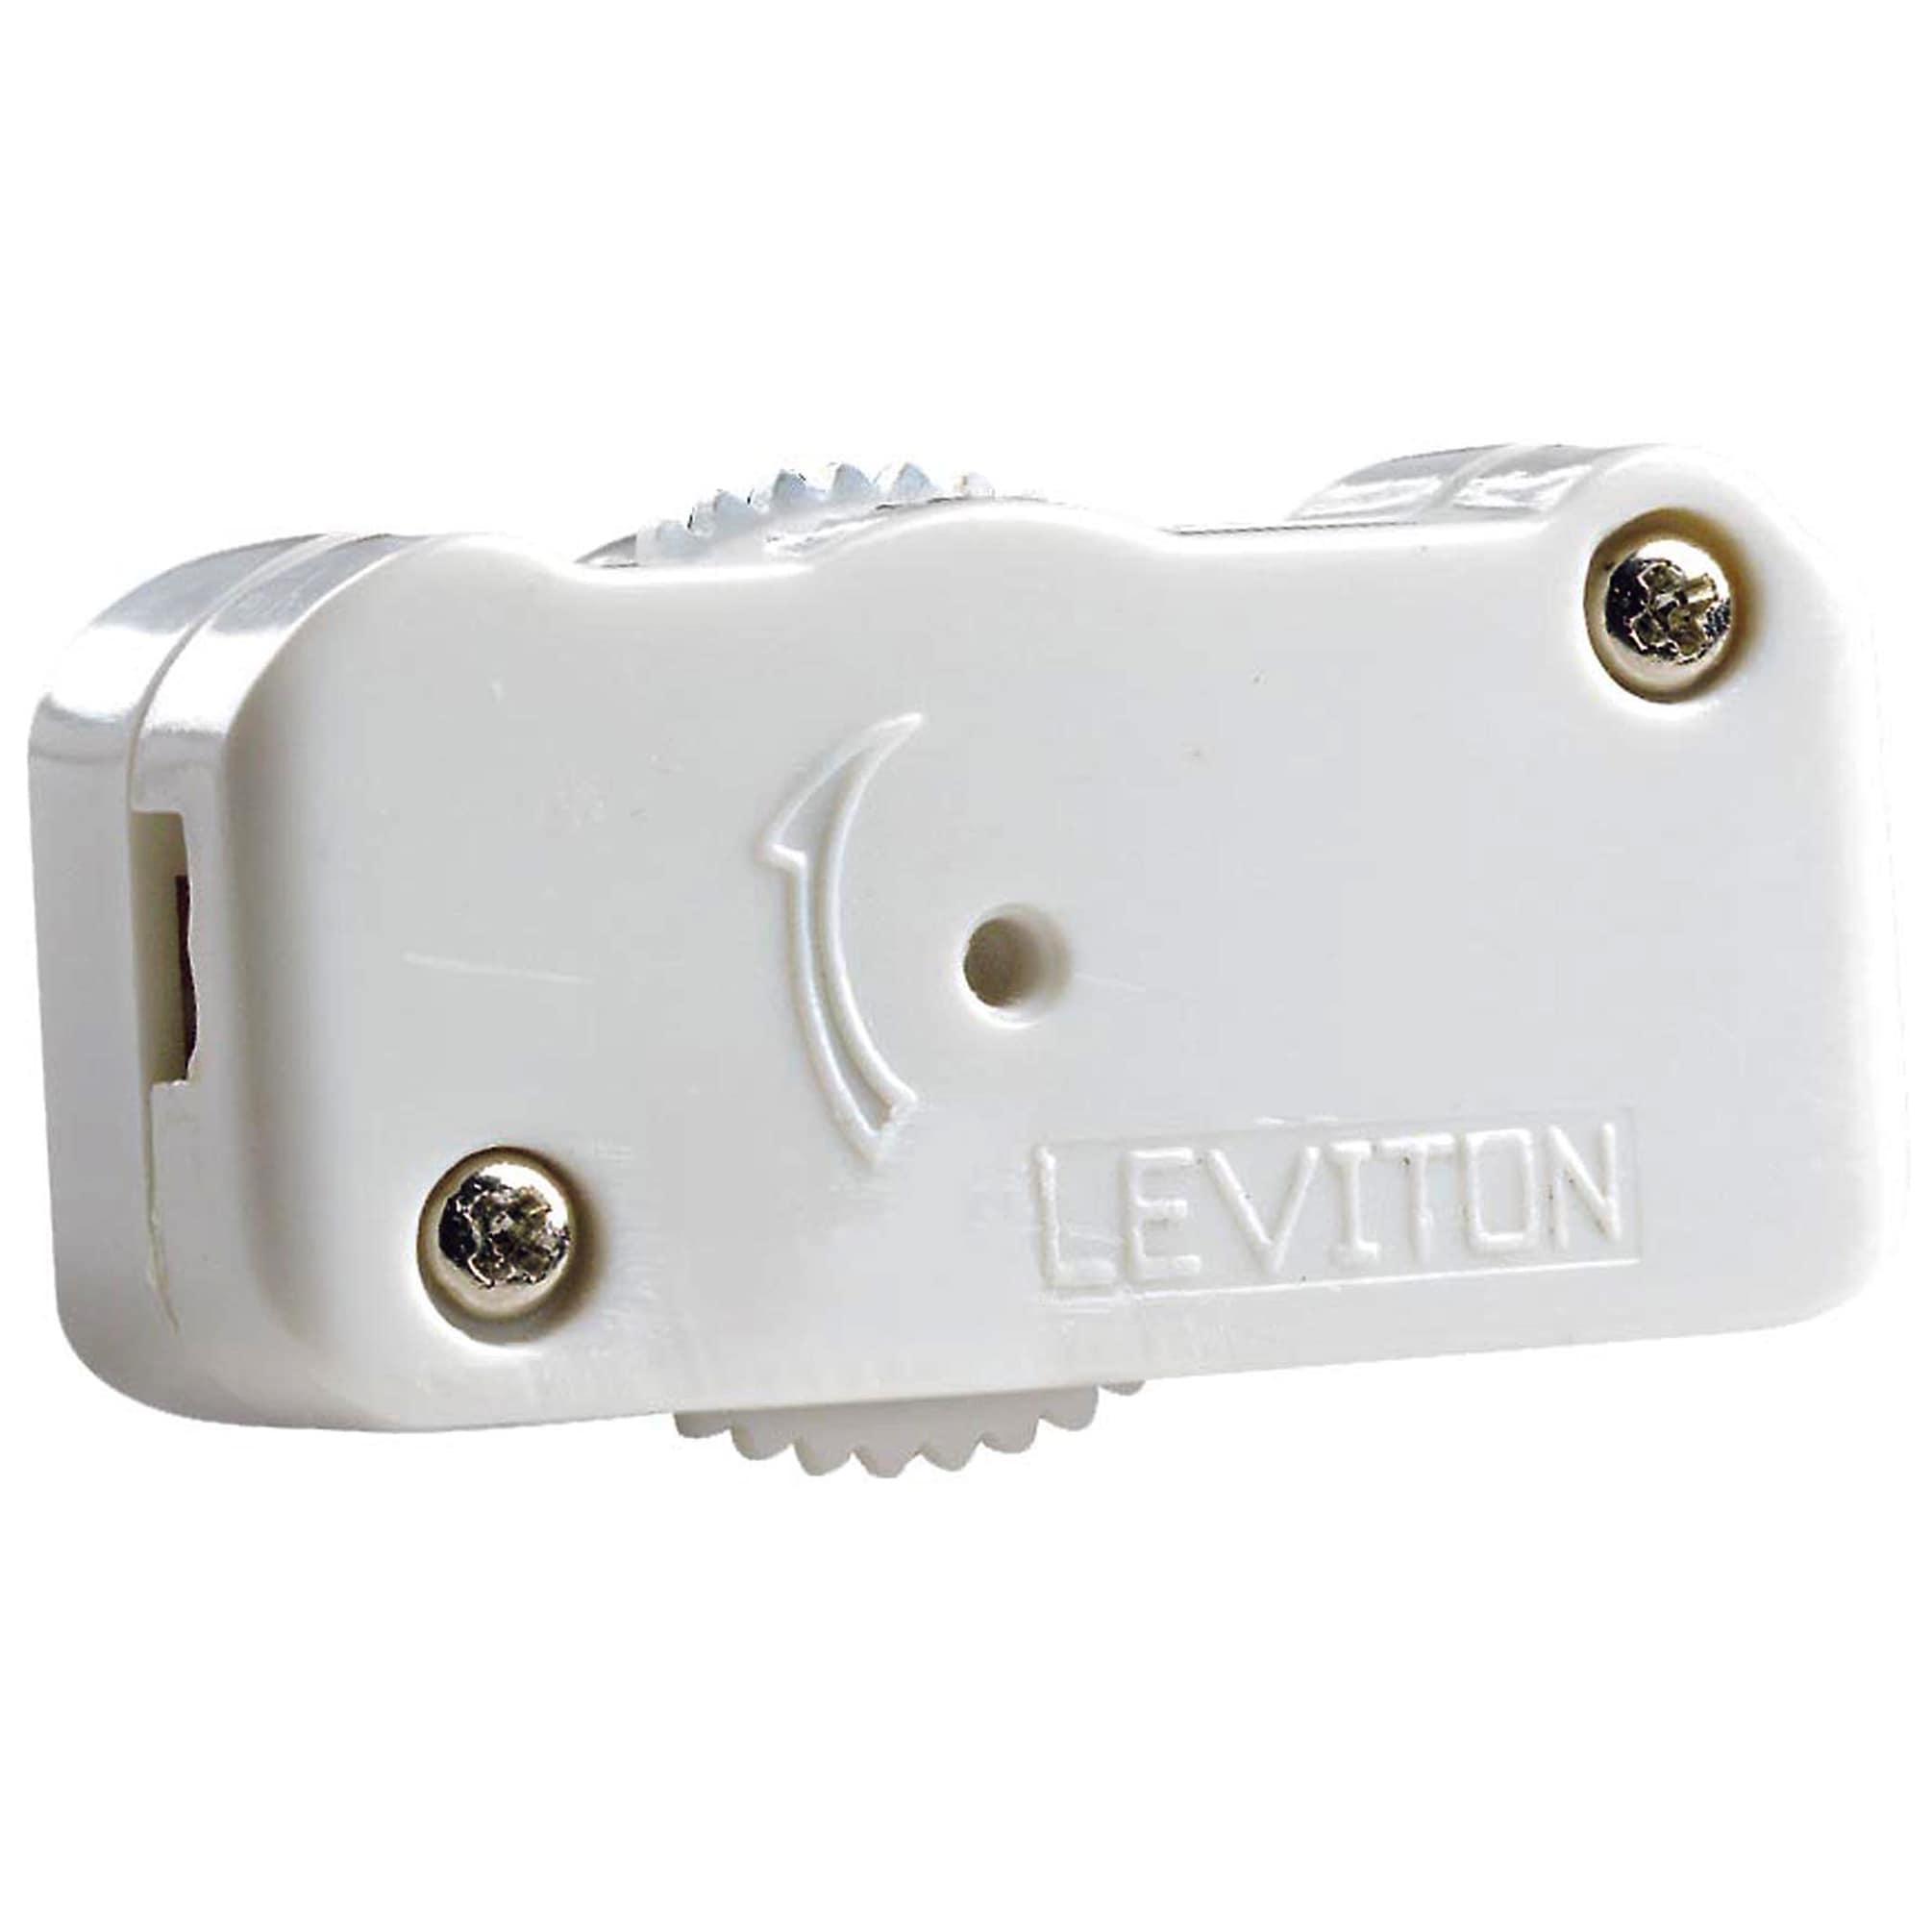 Leviton C22-01420-00W 200 Watt White Cord Dimmer Switch - Free ...